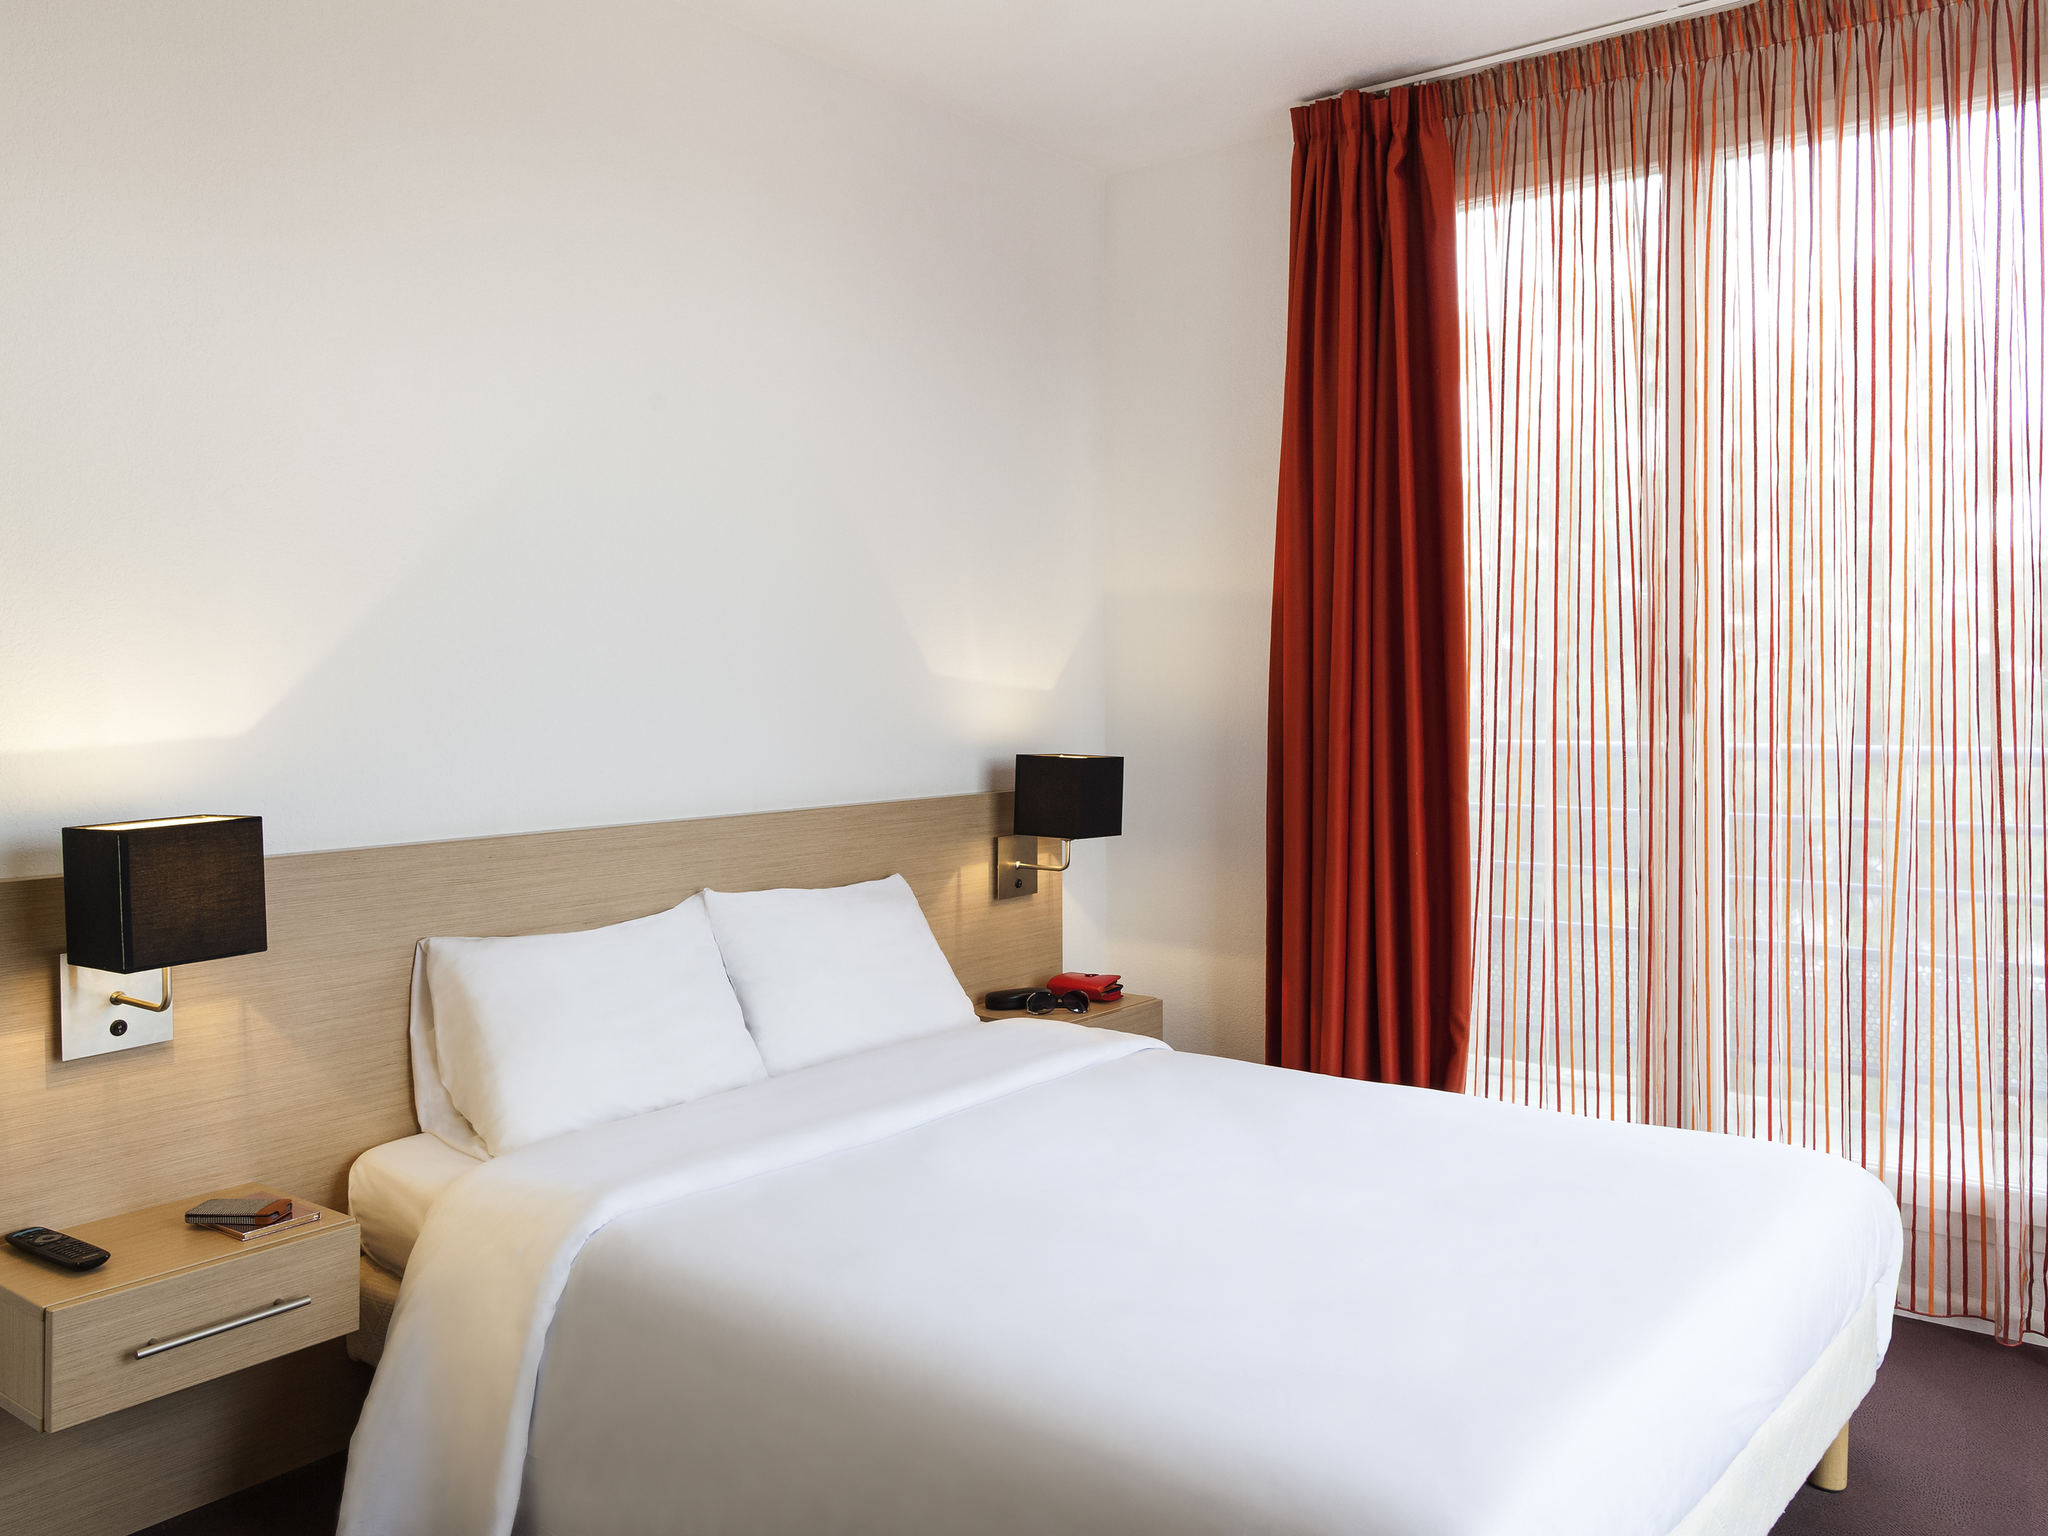 Hotel – Aparthotel Adagio access Saint-Louis Bâle